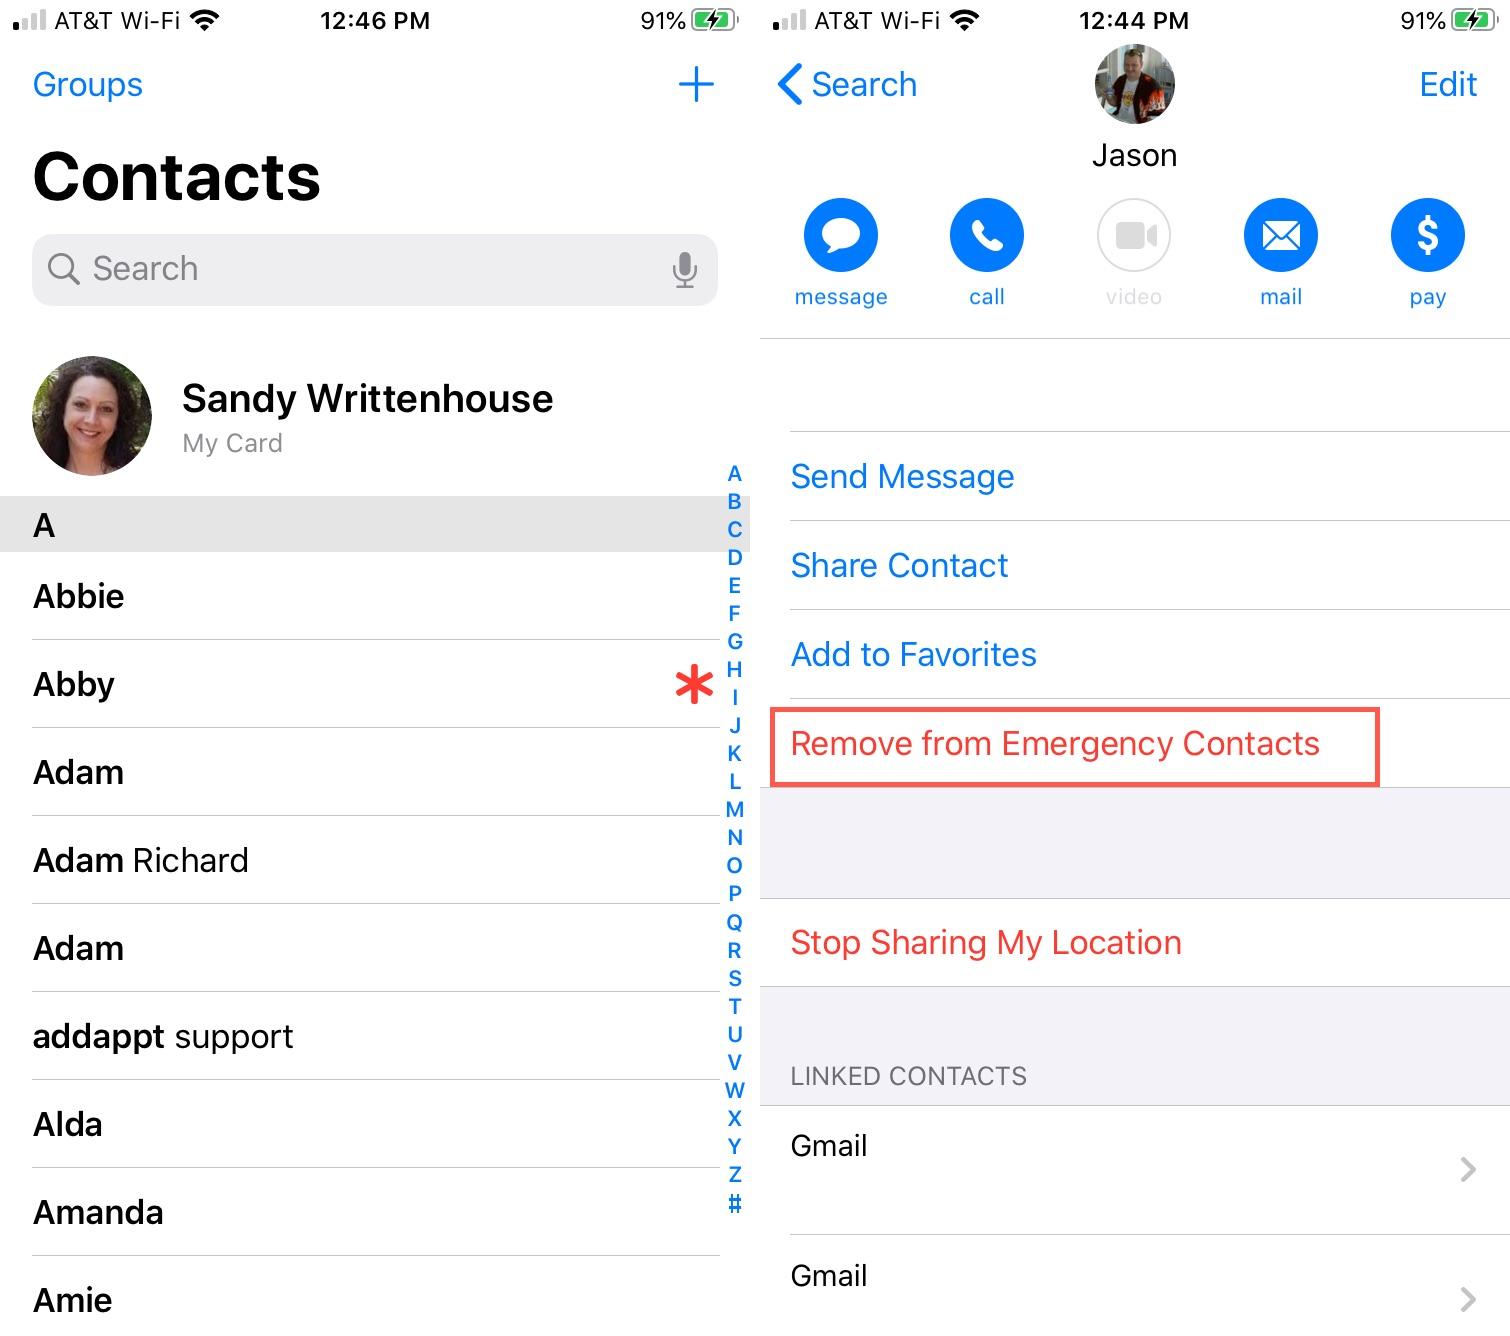 Danh bạ khẩn cấp Dấu hoa thị Loại bỏ iPhone